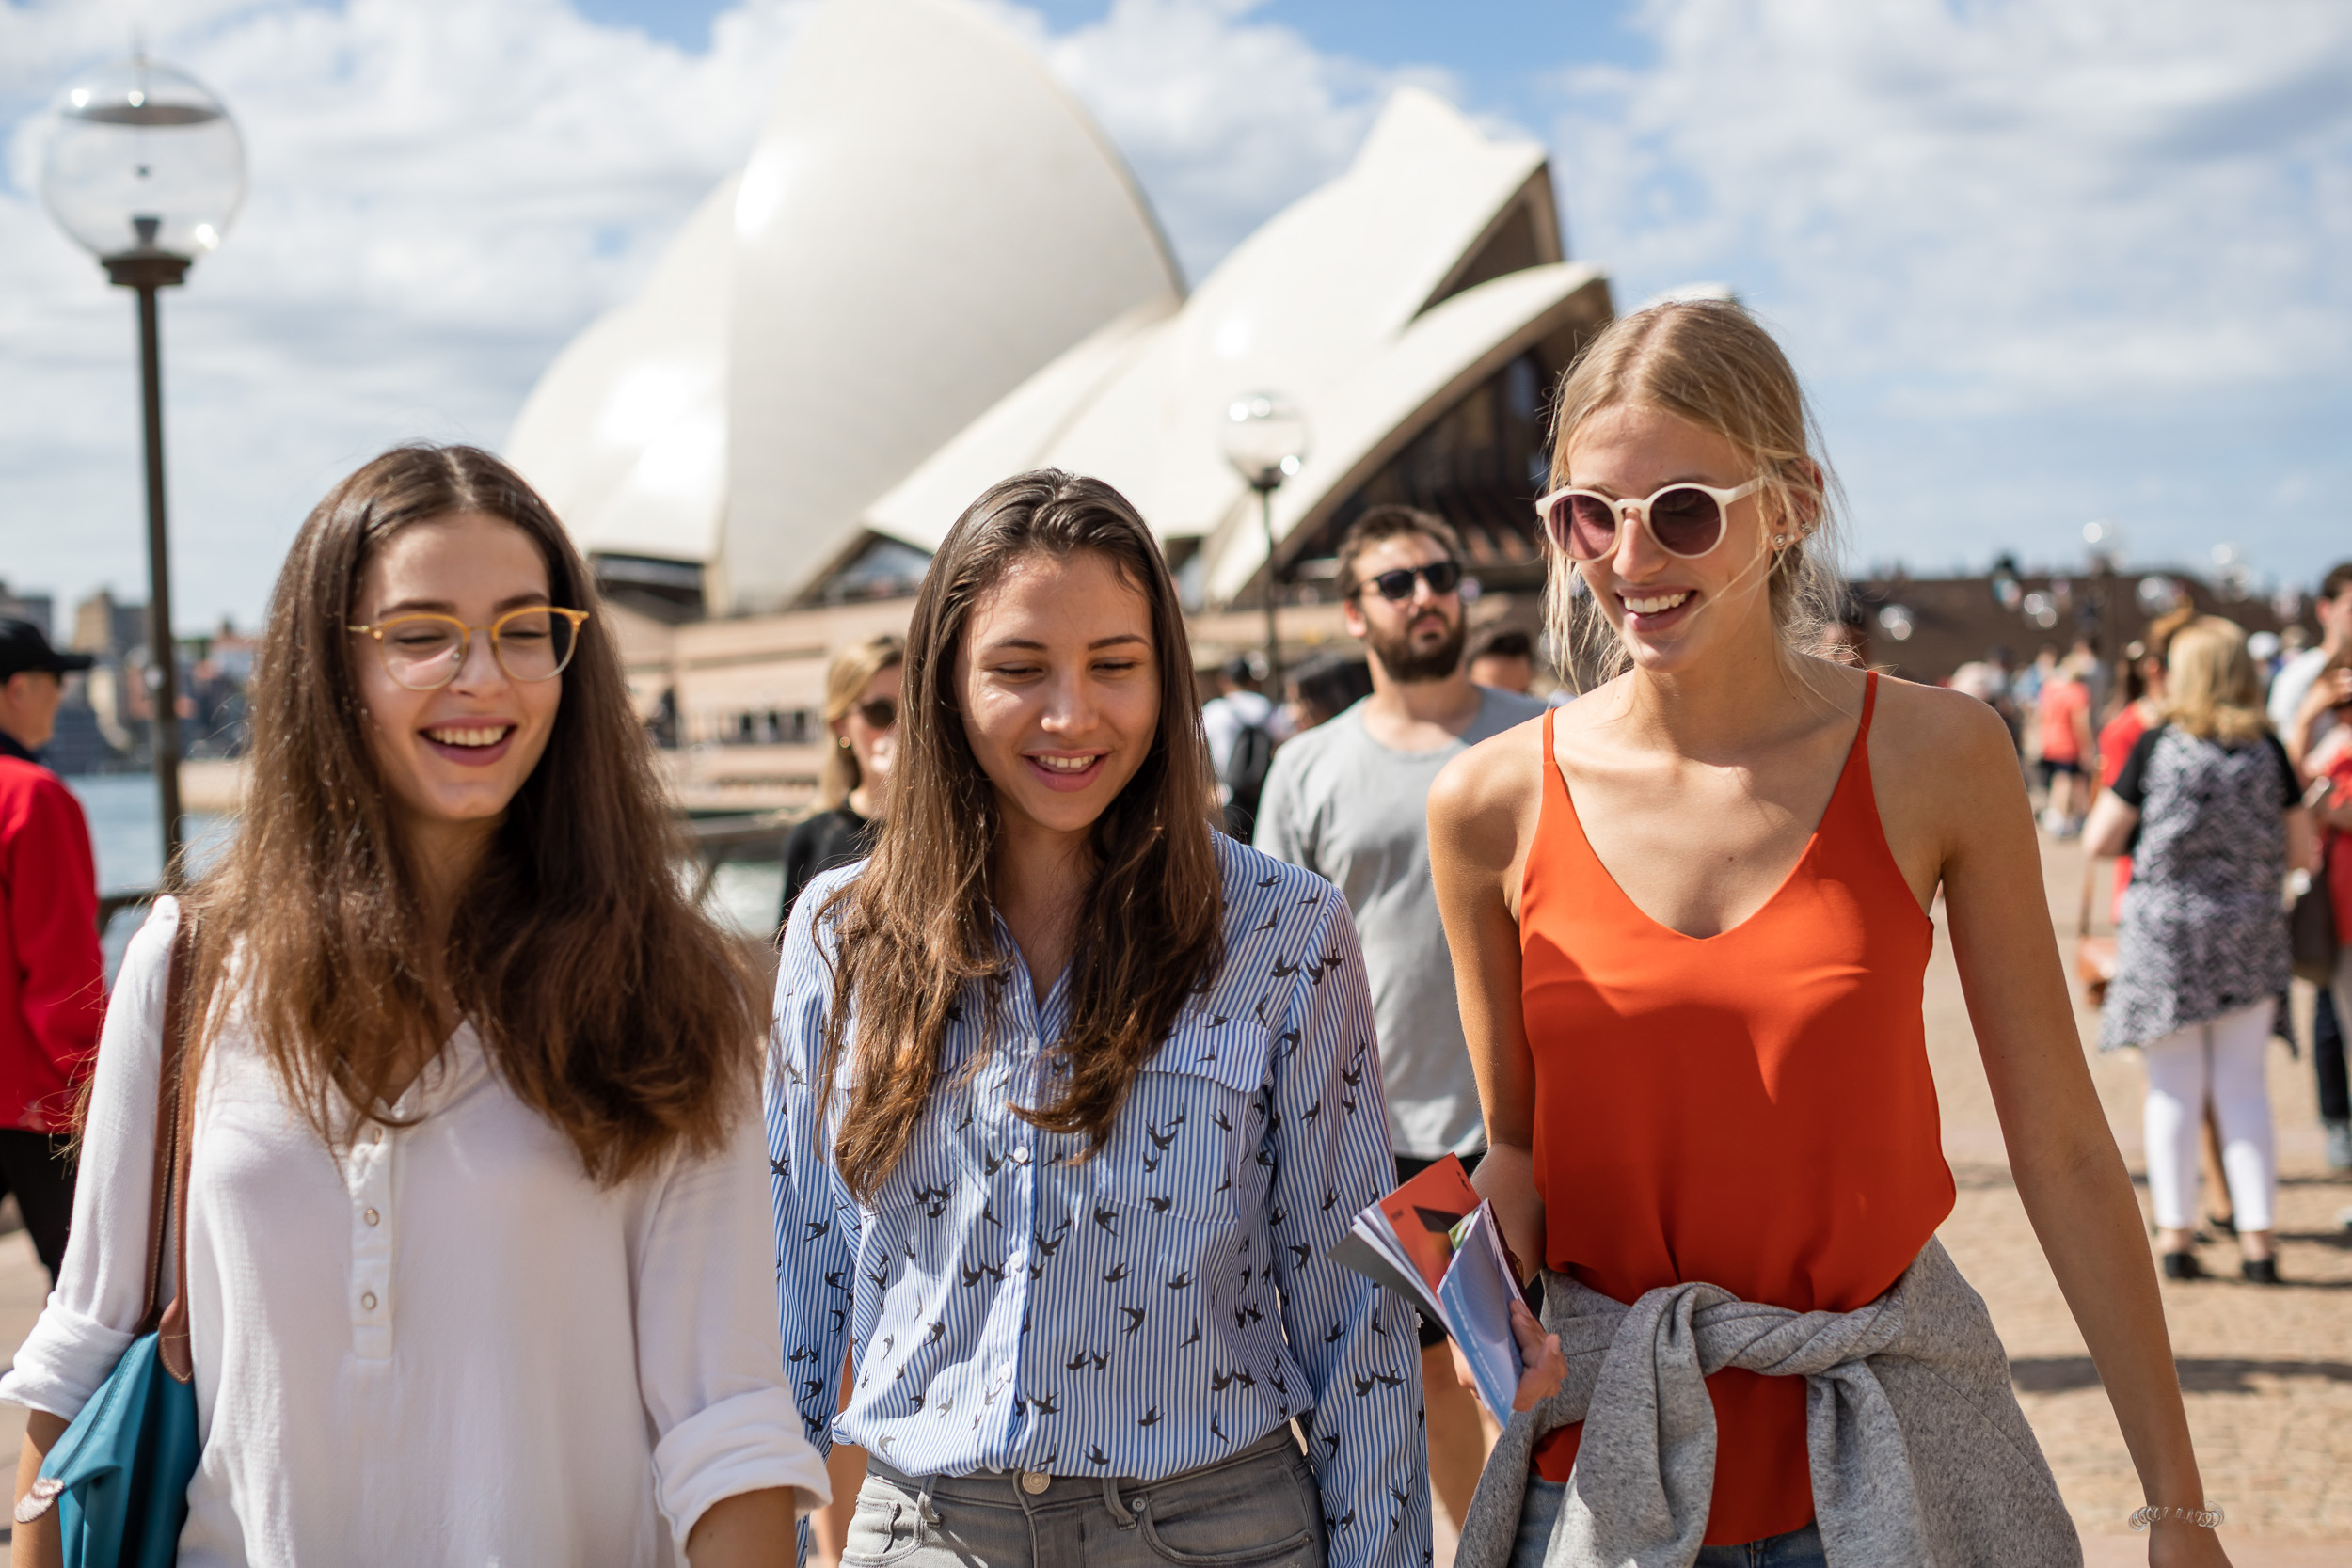 Event - Field Trip - Marketing - Andy West - NYU Sydney 2018